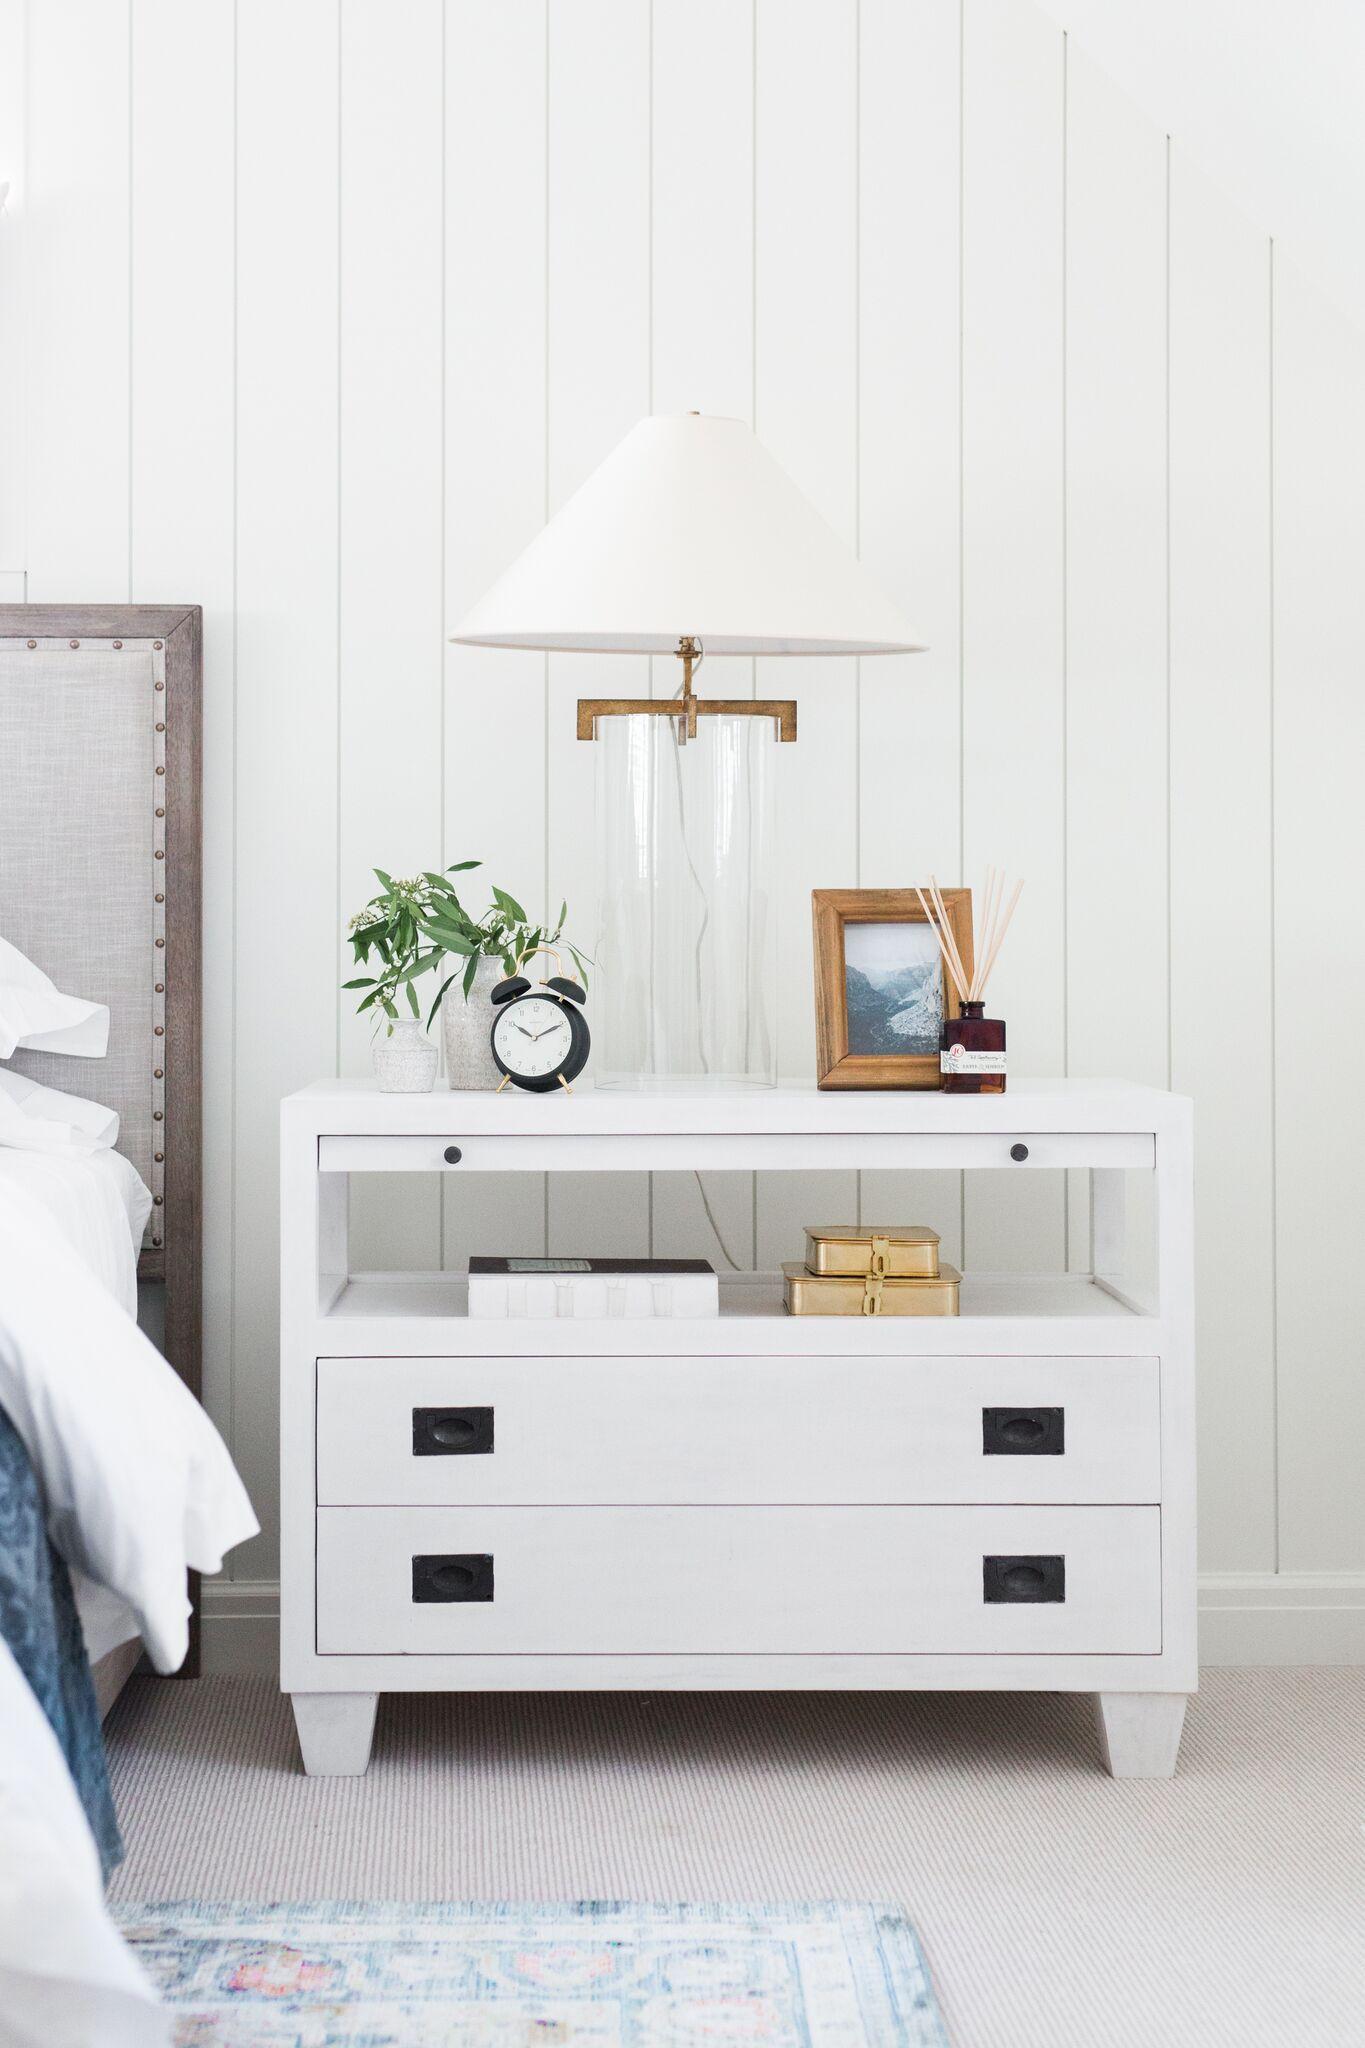 Master bedroom inspiration  Wilson Master Bedroom Renovation Reveal  Studio mcgee and Bedrooms